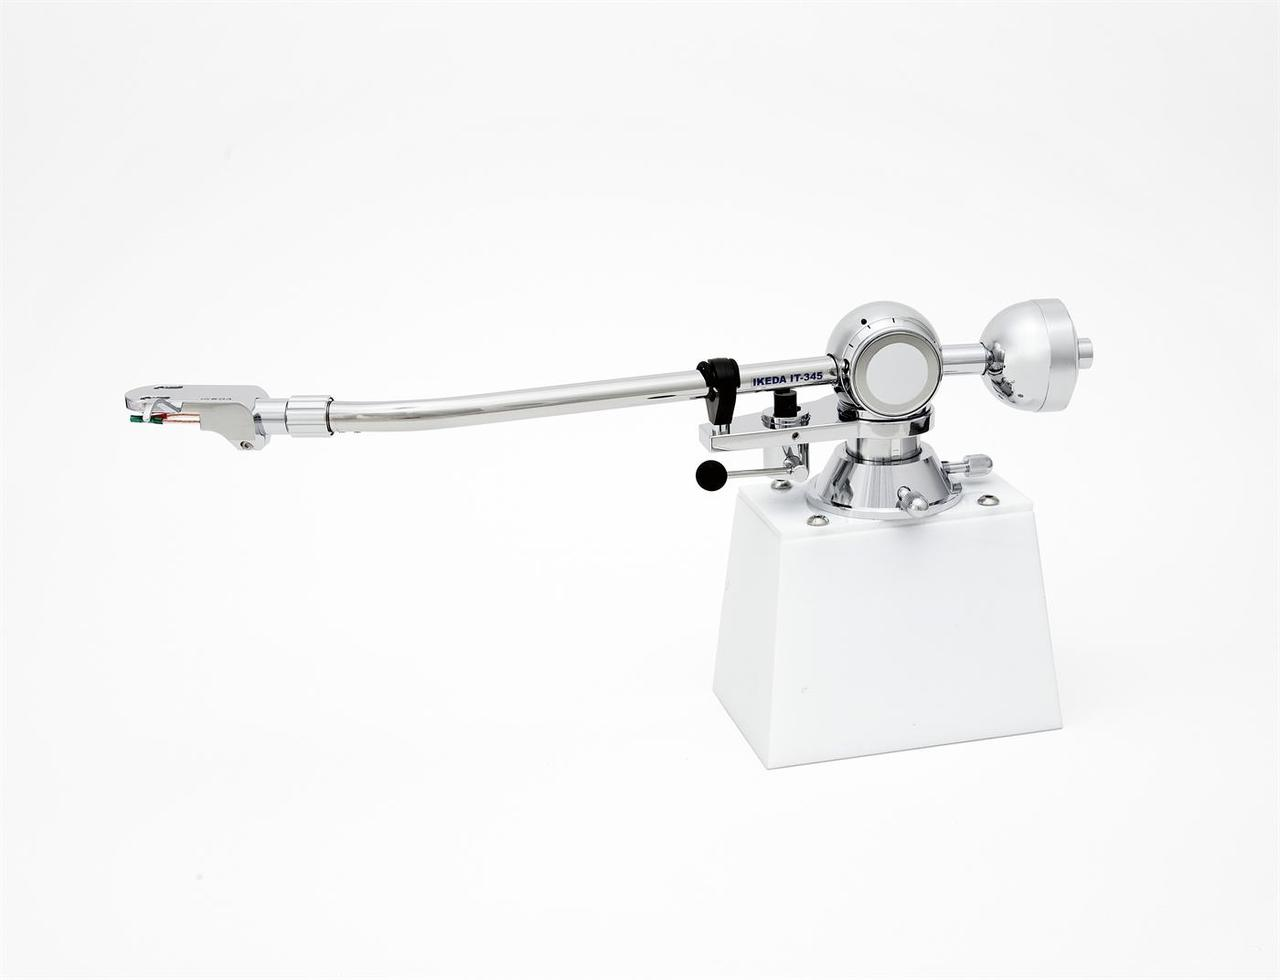 Ikea IT-345CR1 9 Inch Tone Arm. At True Audiophile.